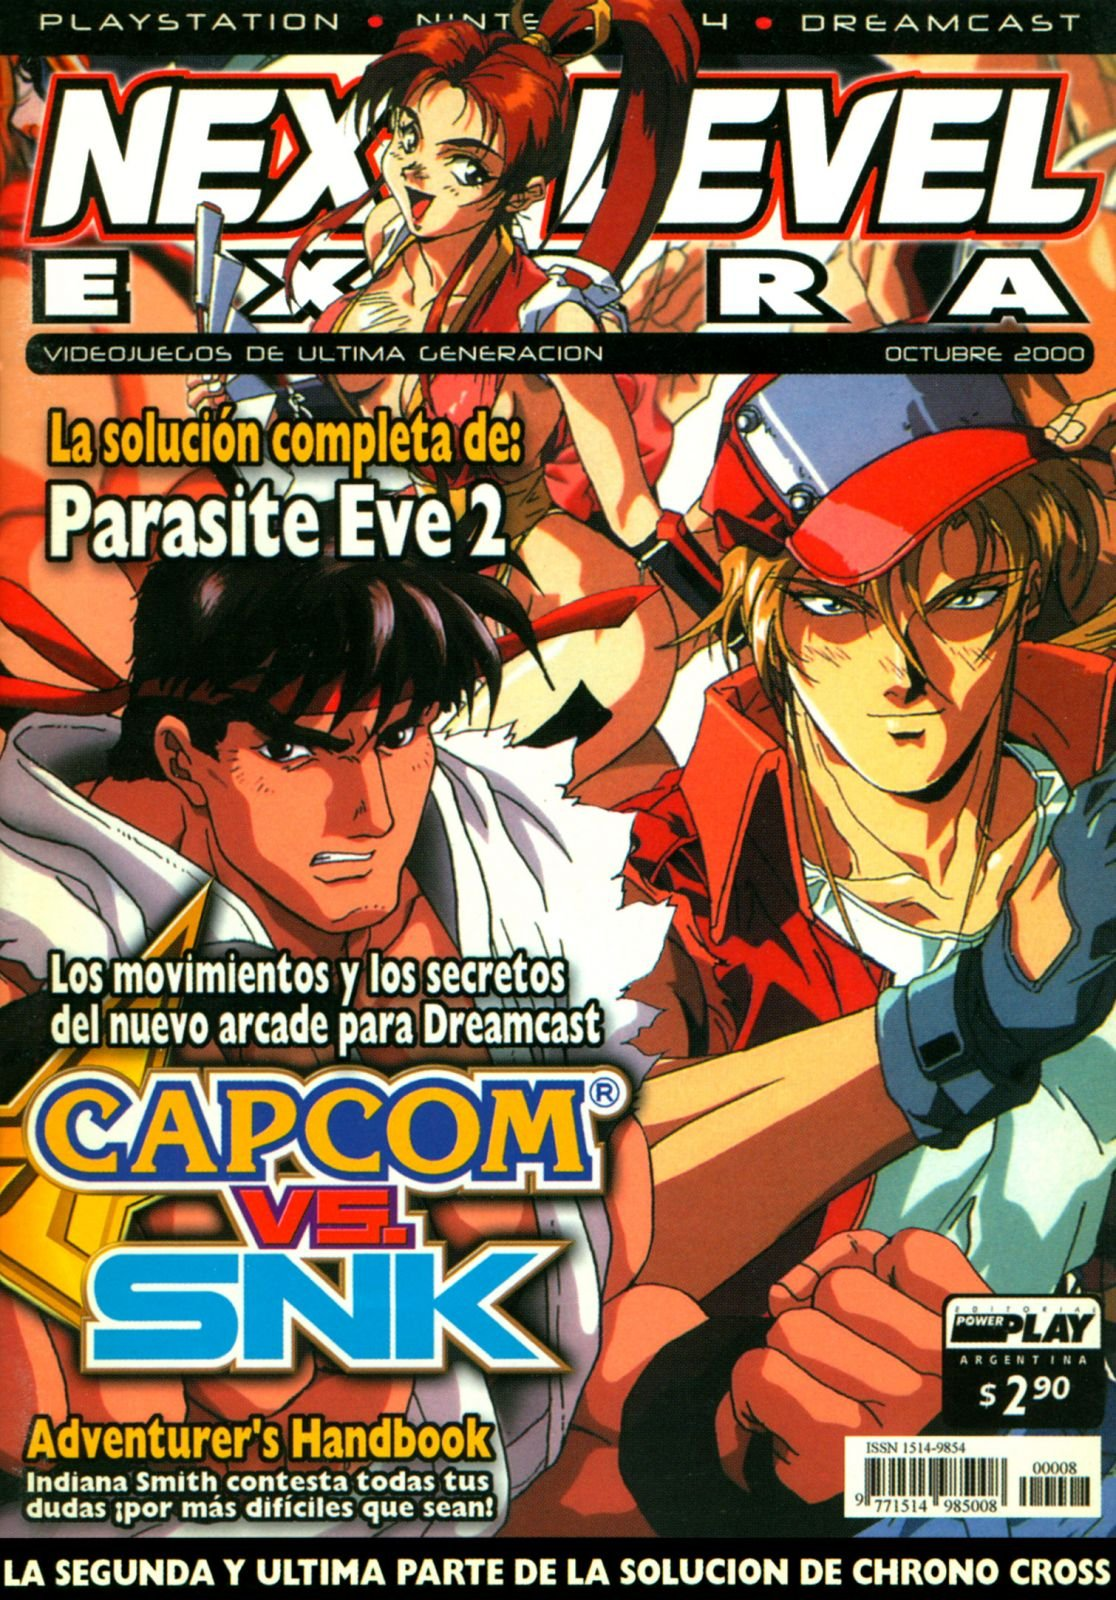 Next Level Extra 08 October 2000